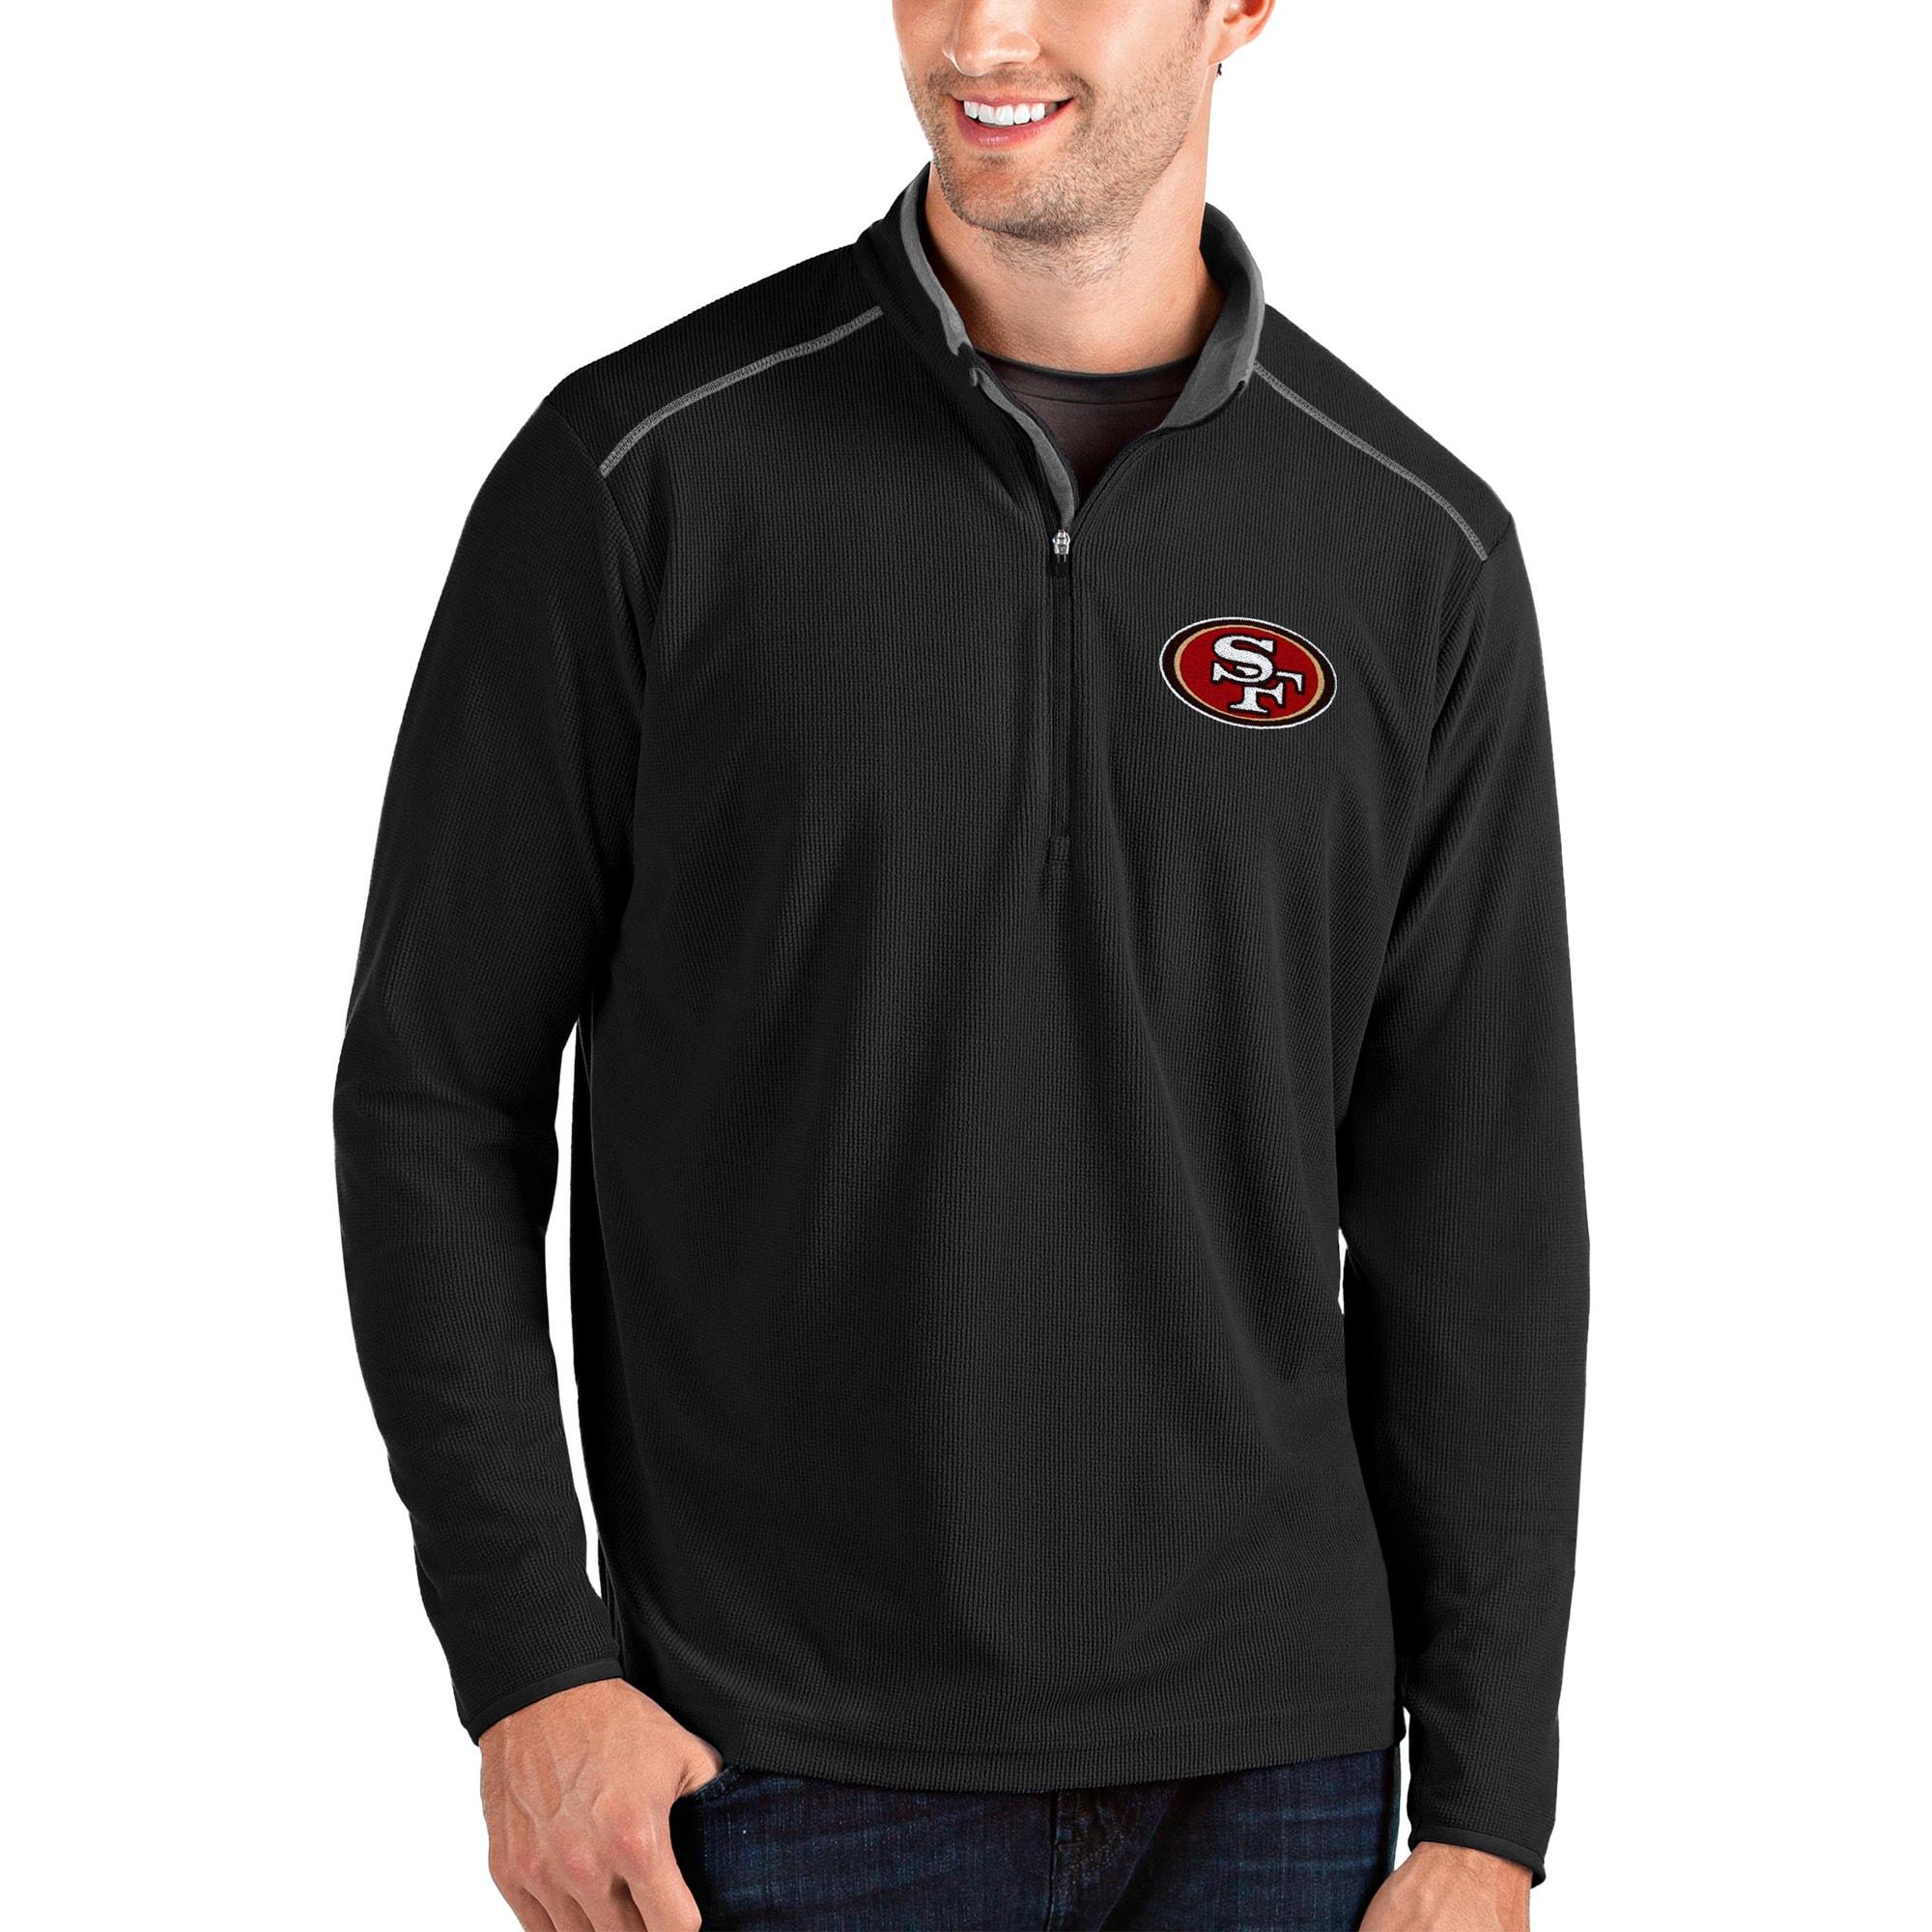 San Francisco 49ers Antigua Glacier Quarter-Zip Pullover Jacket - Black/Gray